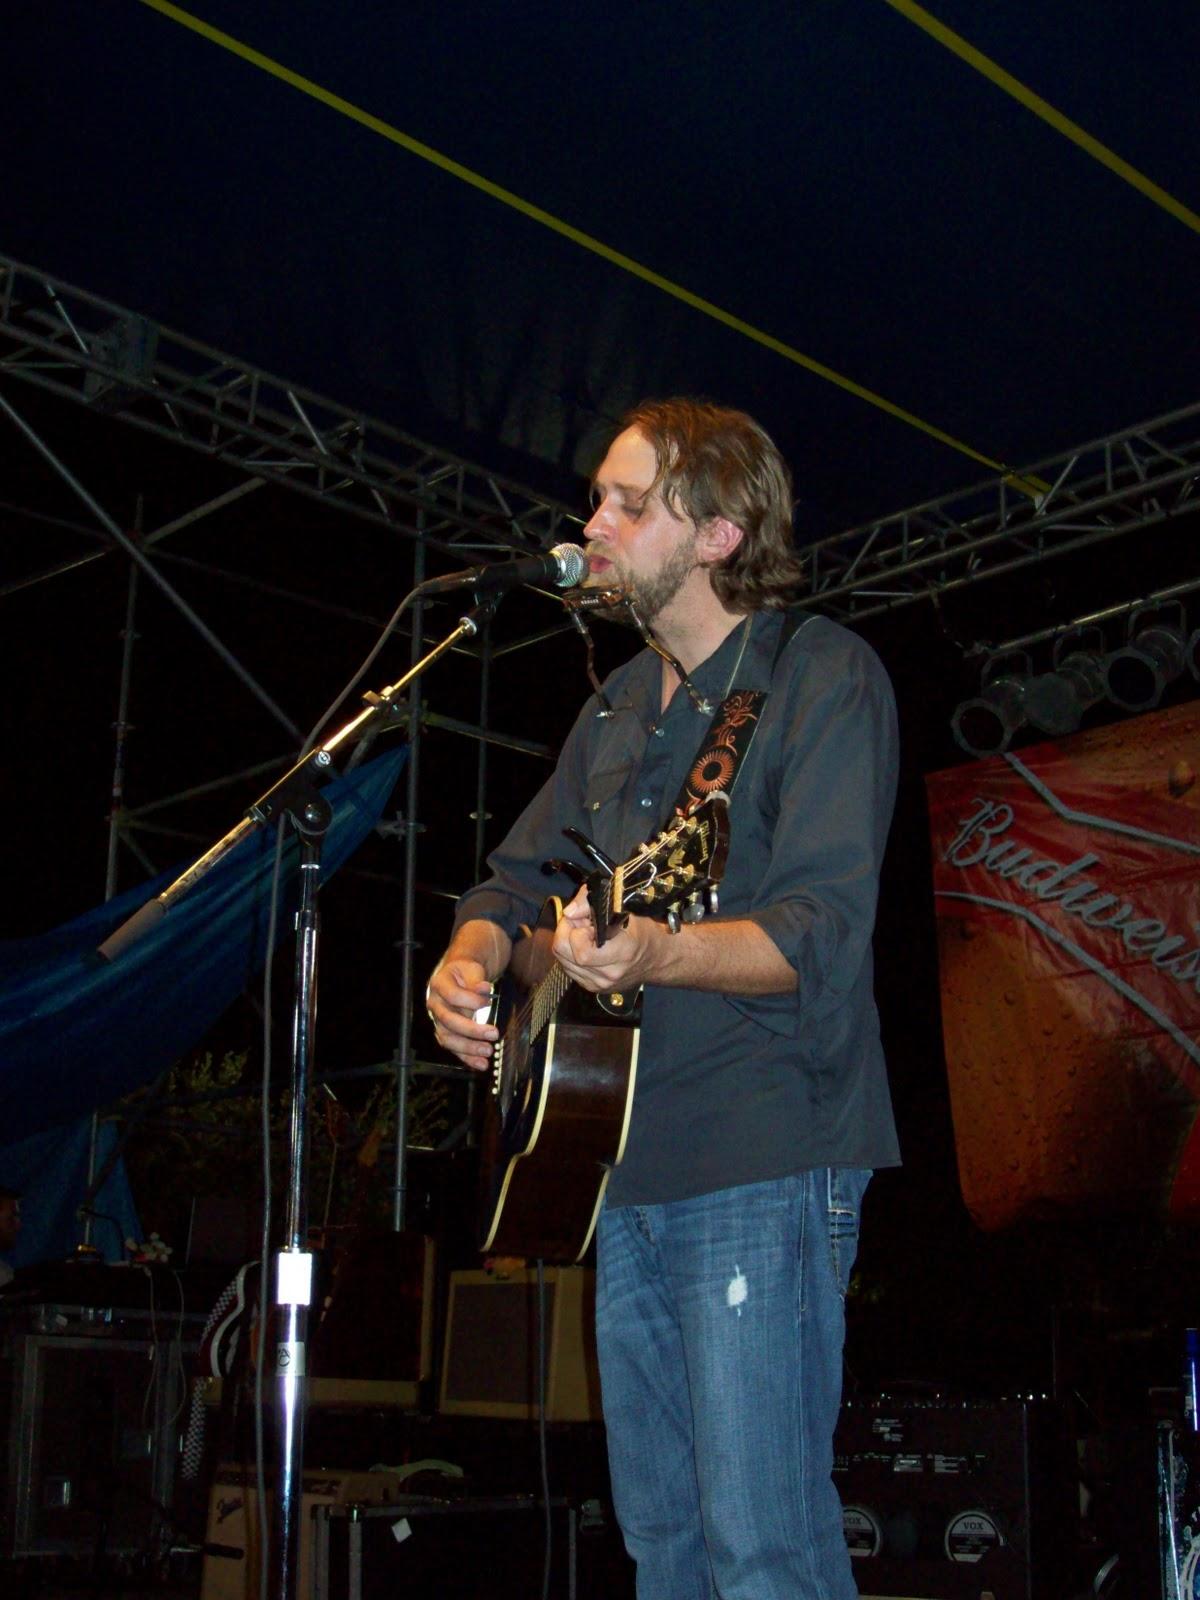 Conroe Cajun Catfish Festival - 101_0522.JPG